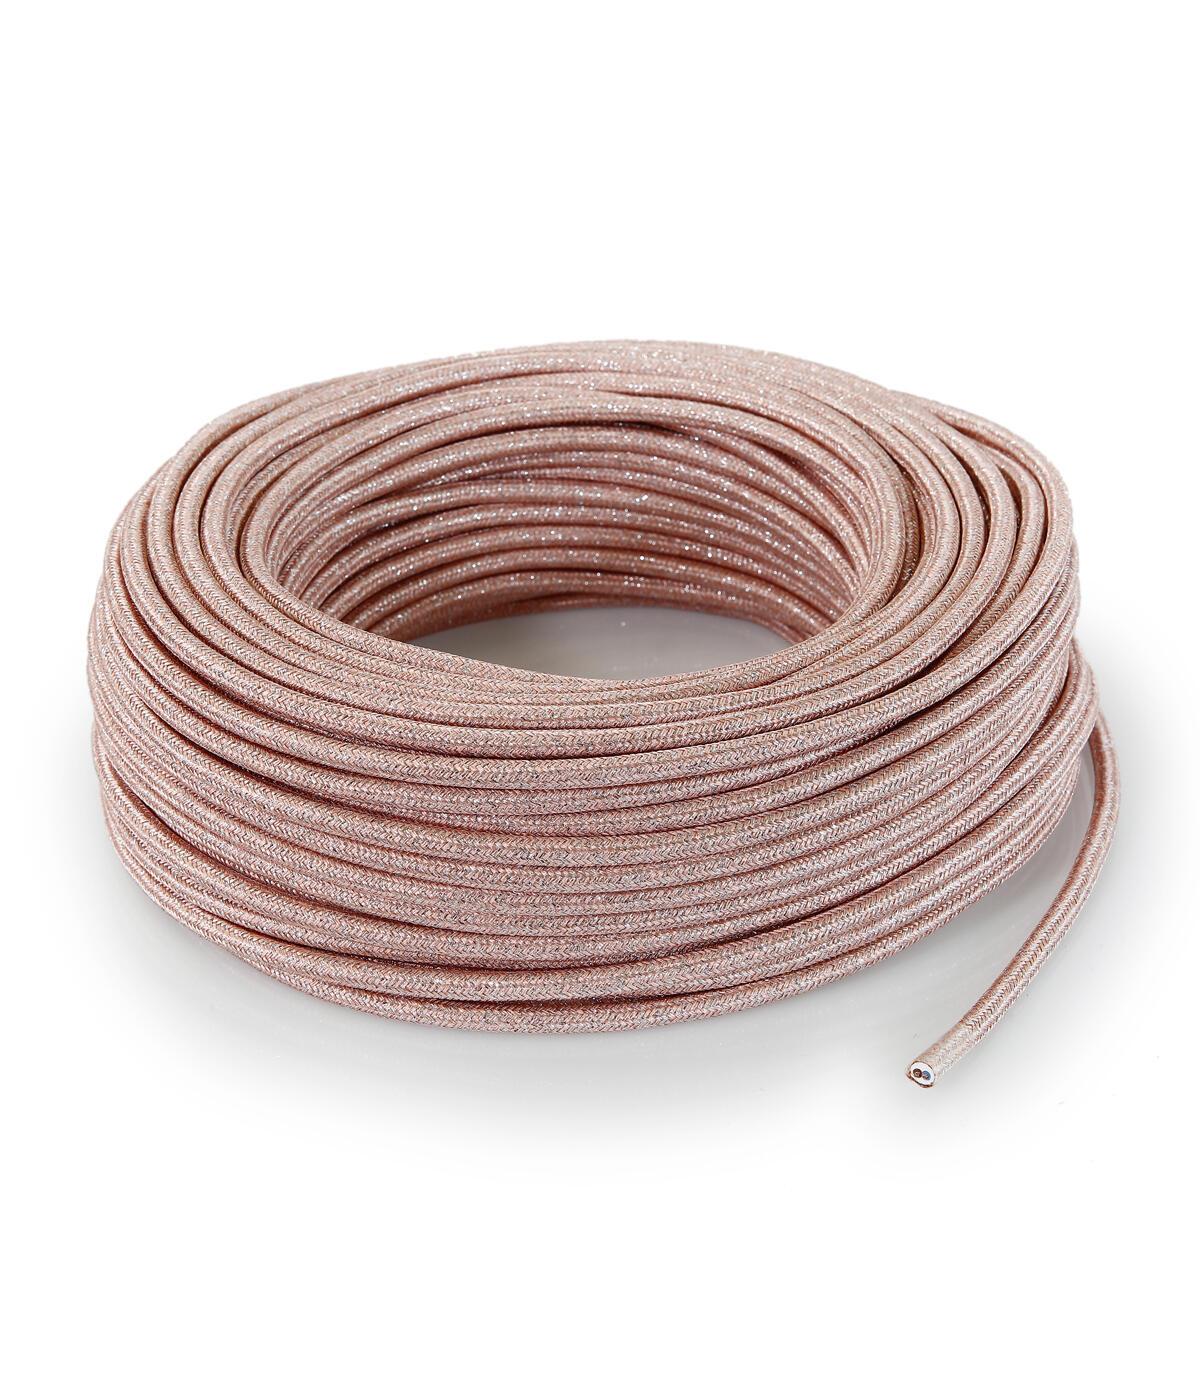 Cavo elettrico lamè rosa H03VV-F 2 fili x 0.75 mm² 50 m MERLOTTI Matassa